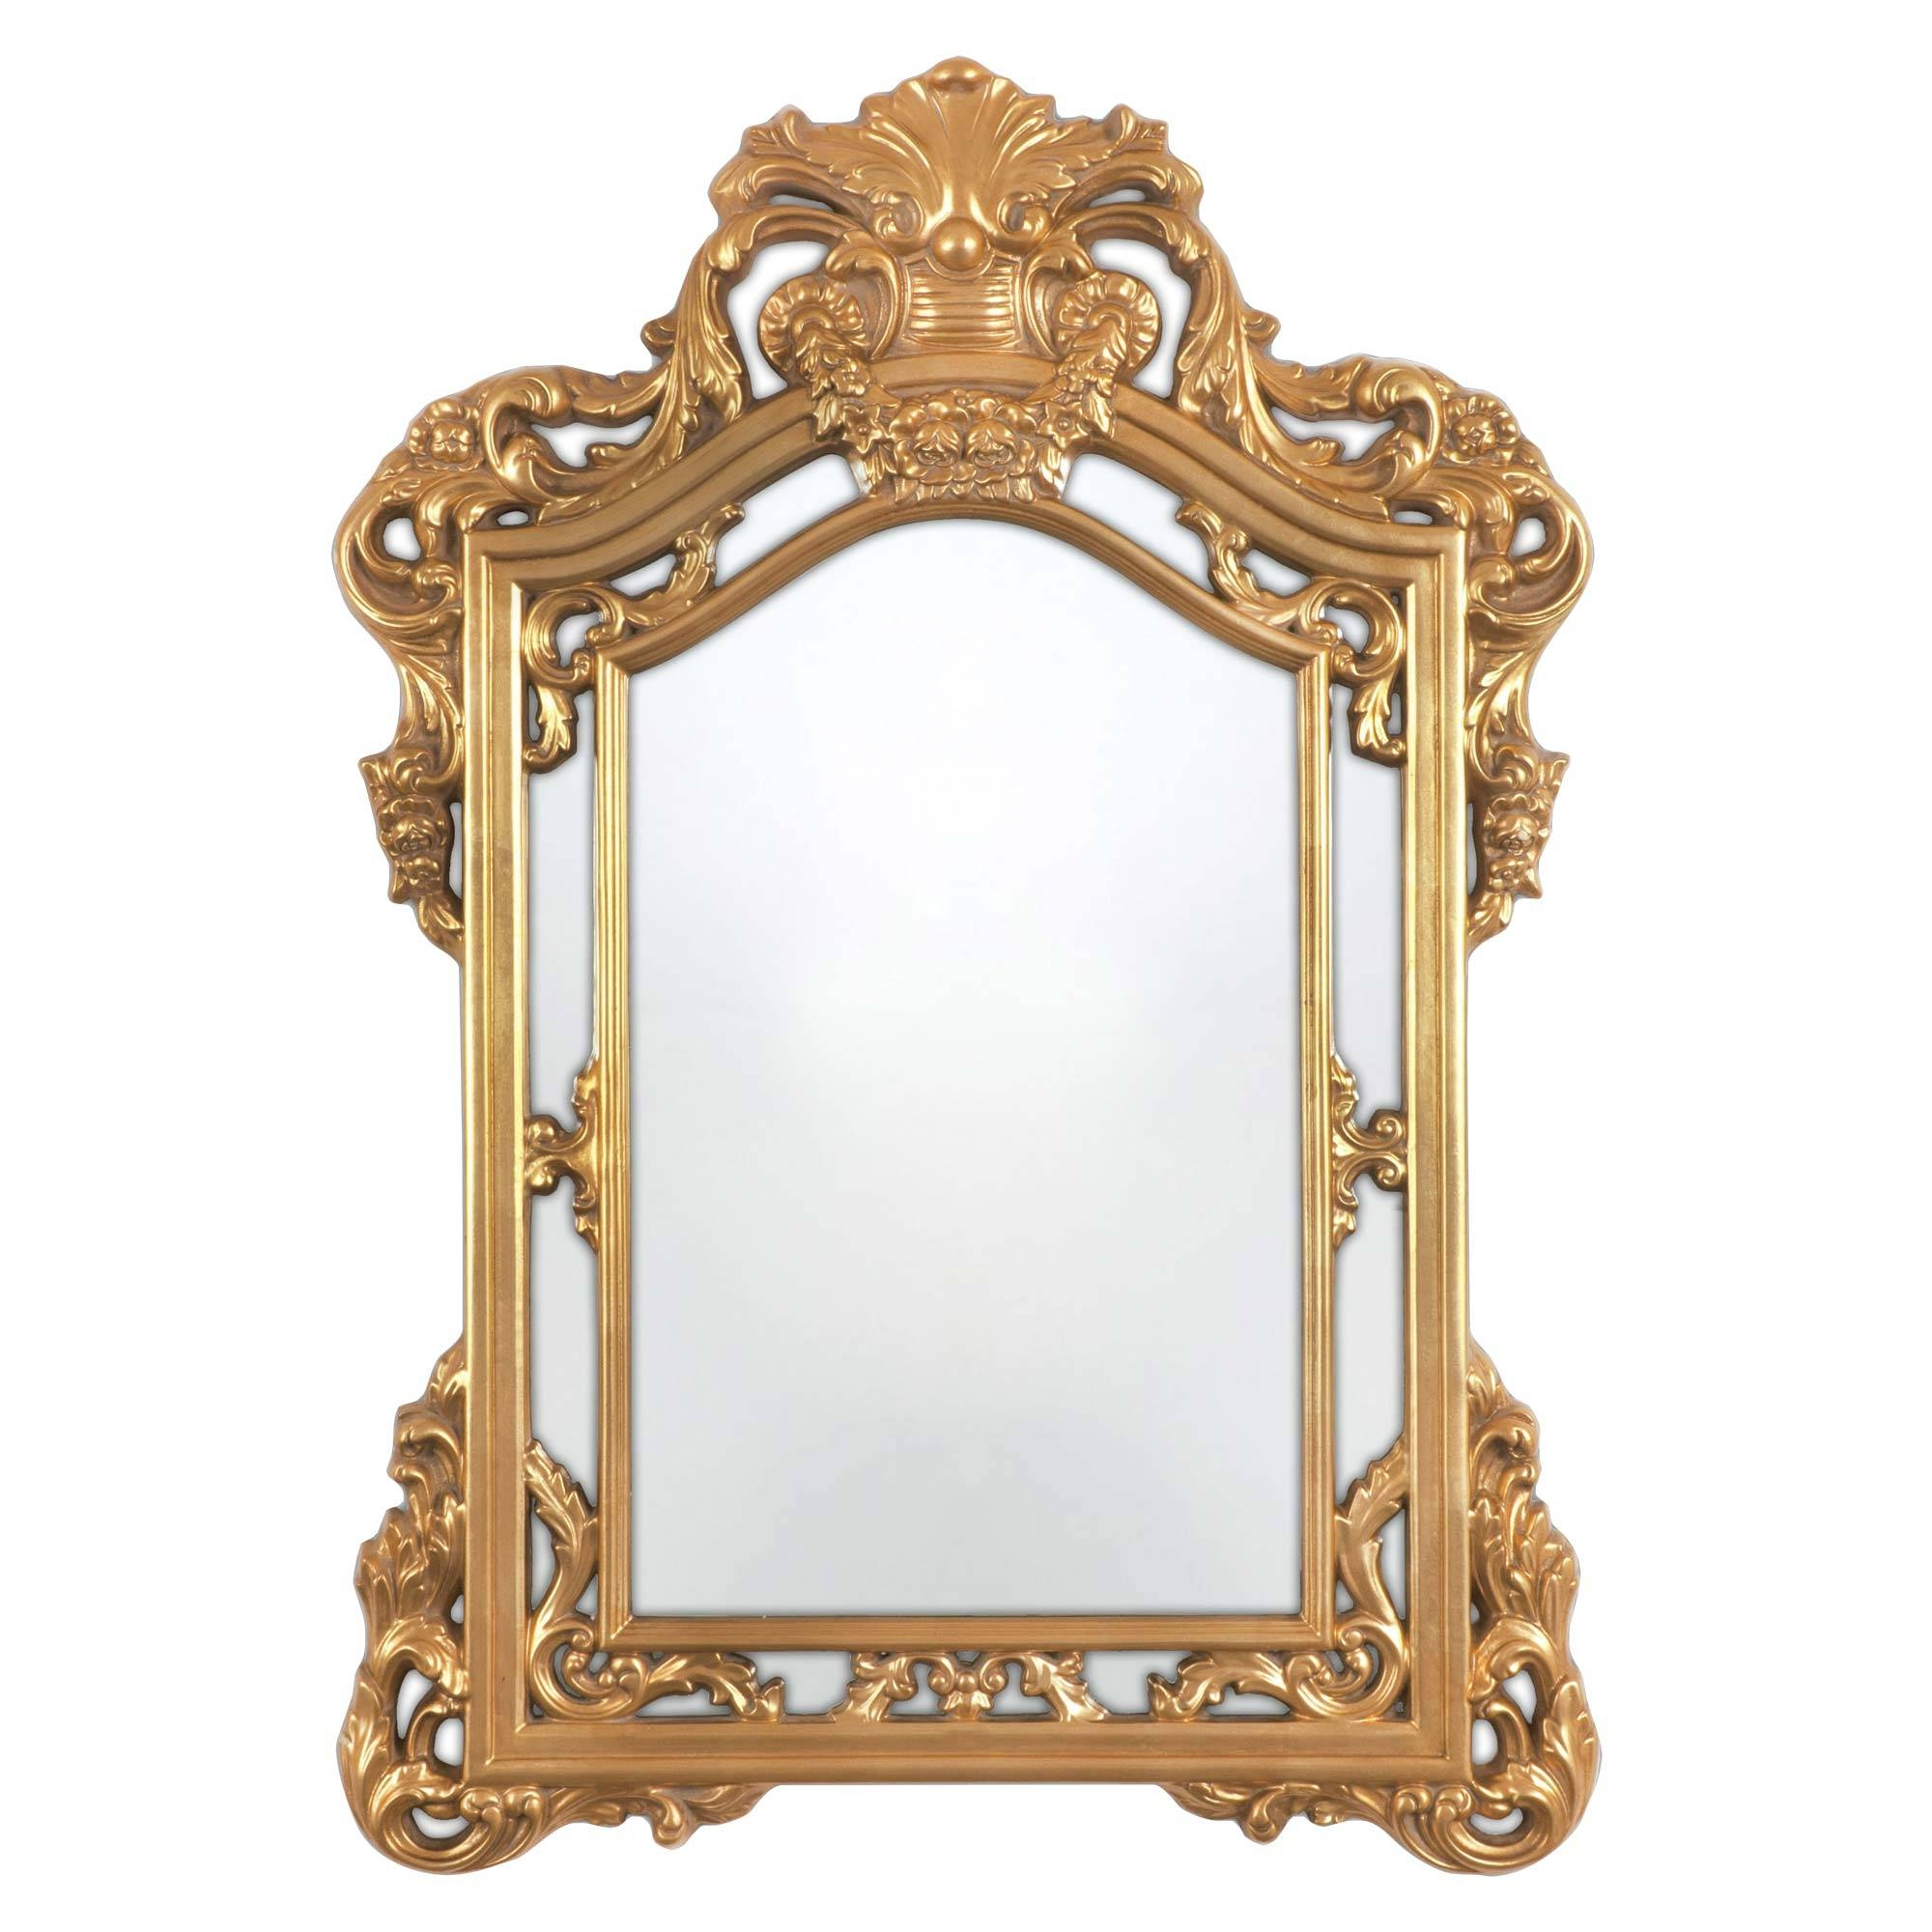 Bathroom: Astounding Baroque Mirror With Unique Frame For Bathroom Within Silver Baroque Mirrors (View 3 of 15)